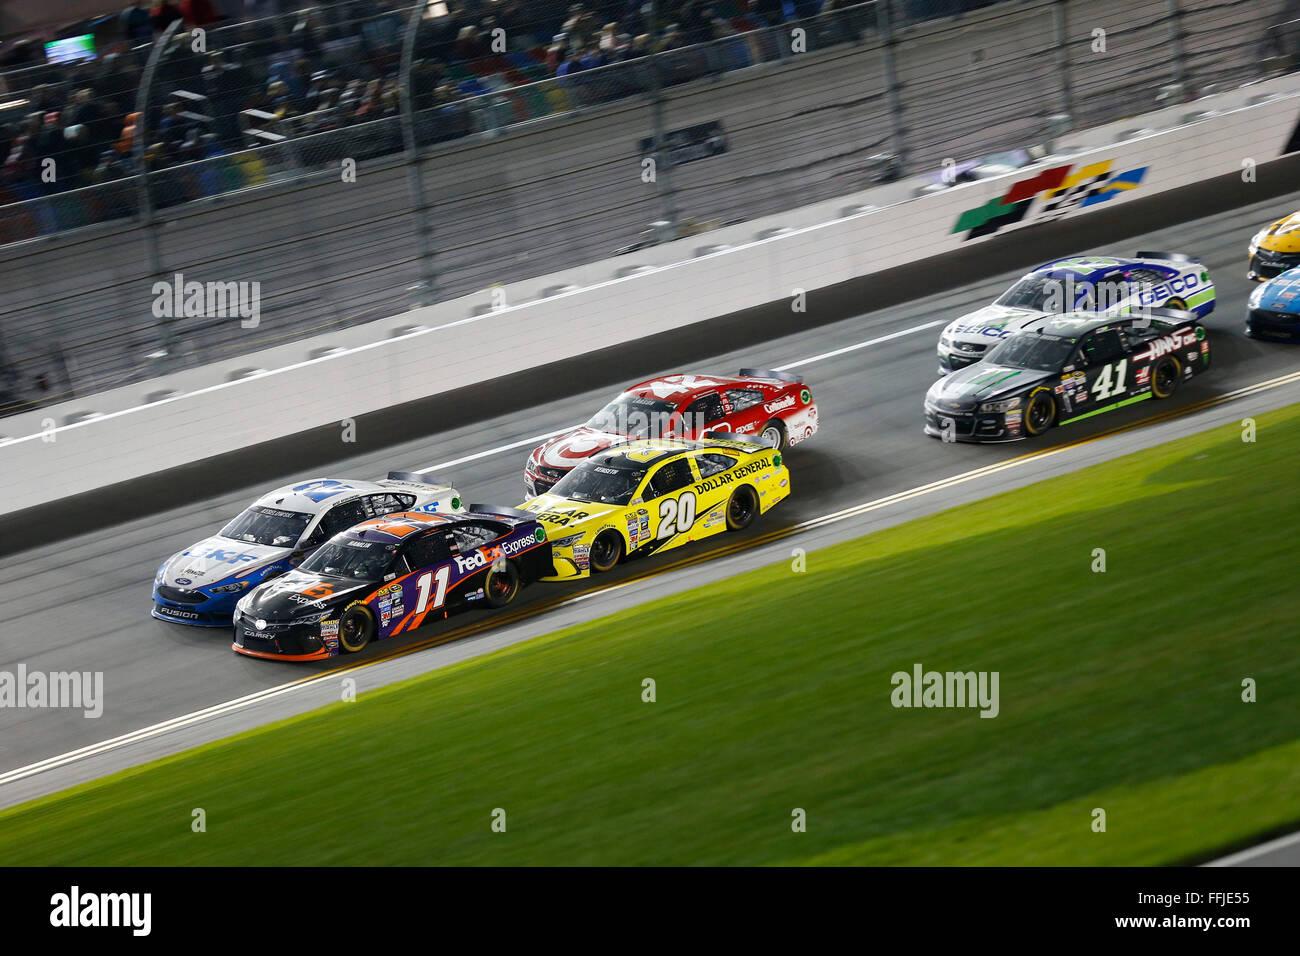 Daytona Beach, FL, USA. 13th Feb, 2016. Daytona Beach, FL - Feb 13, 2016: Denny Hamlin (11) leads the pack back - Stock Image